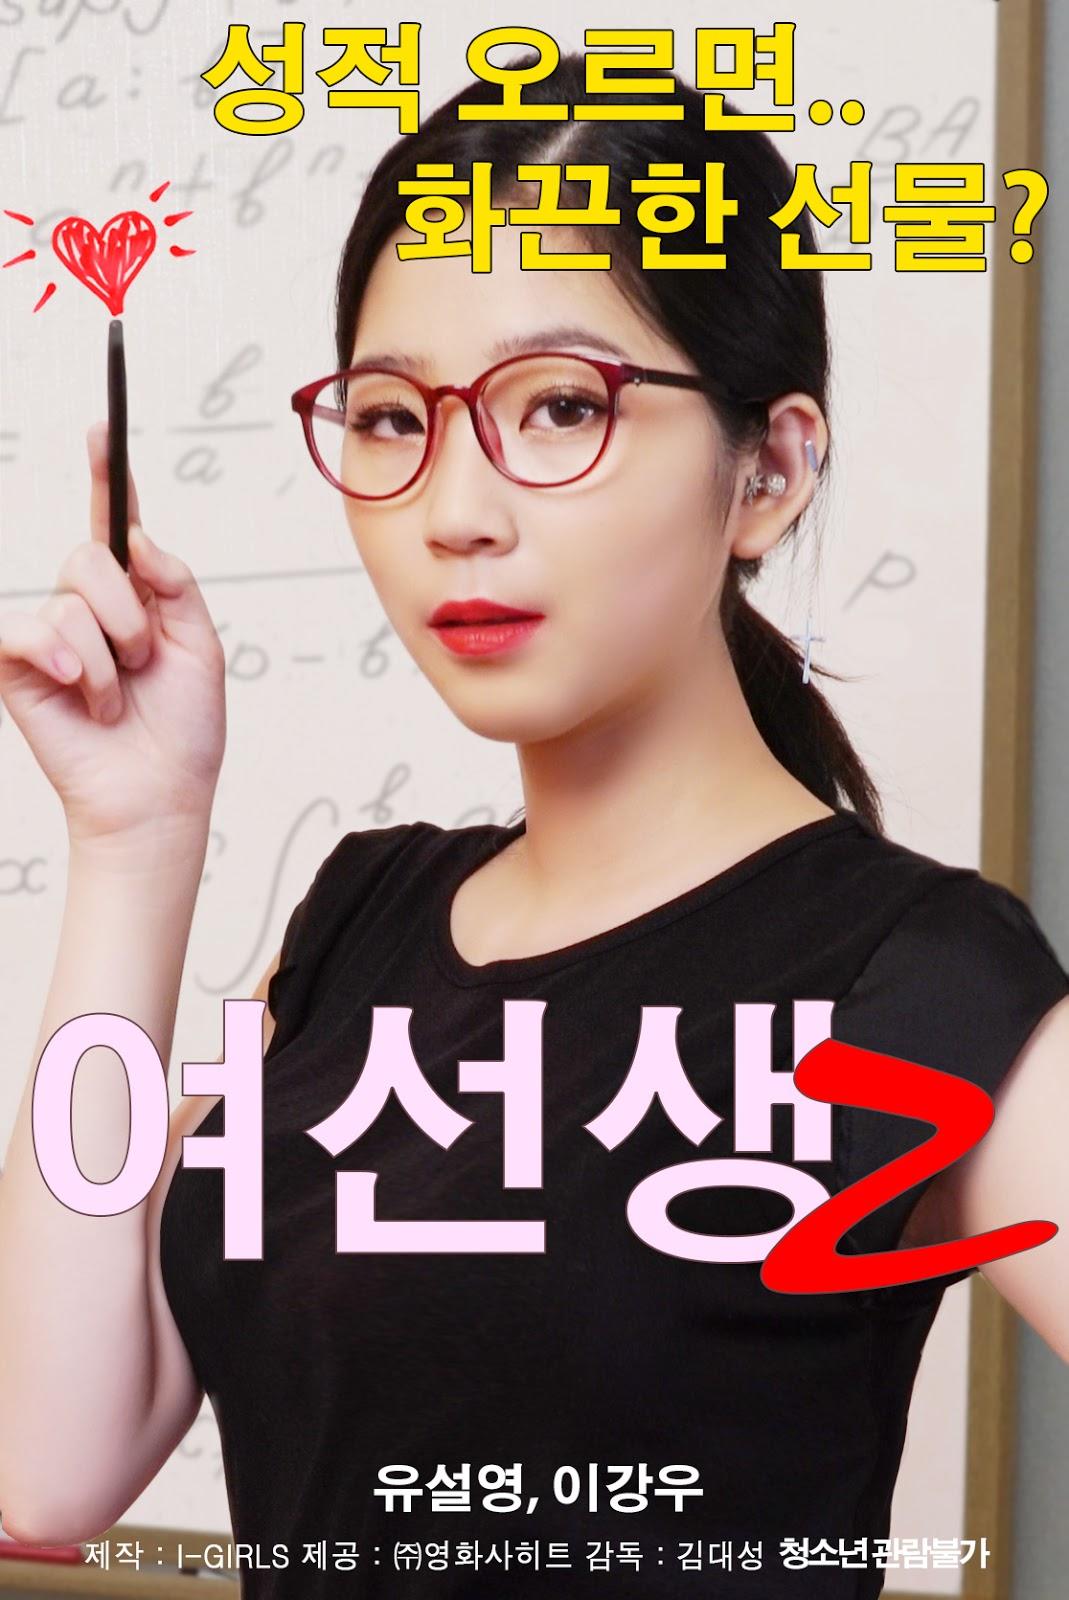 Schoolmistress 2  Full Korea 18+ Adult Movie Online Free